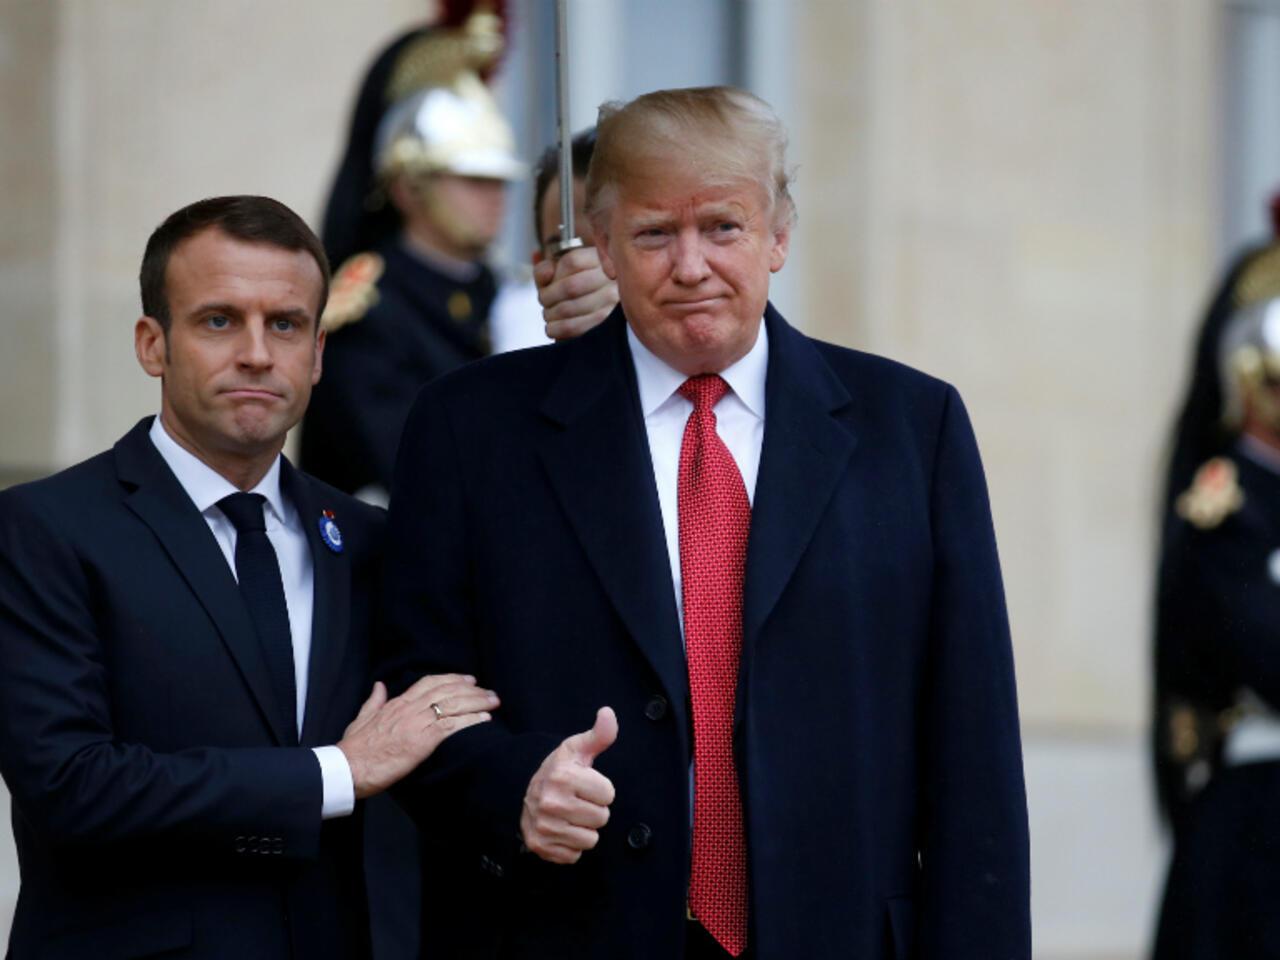 Trump Slams Macron France In Burst Of Tweets After Paris Visit